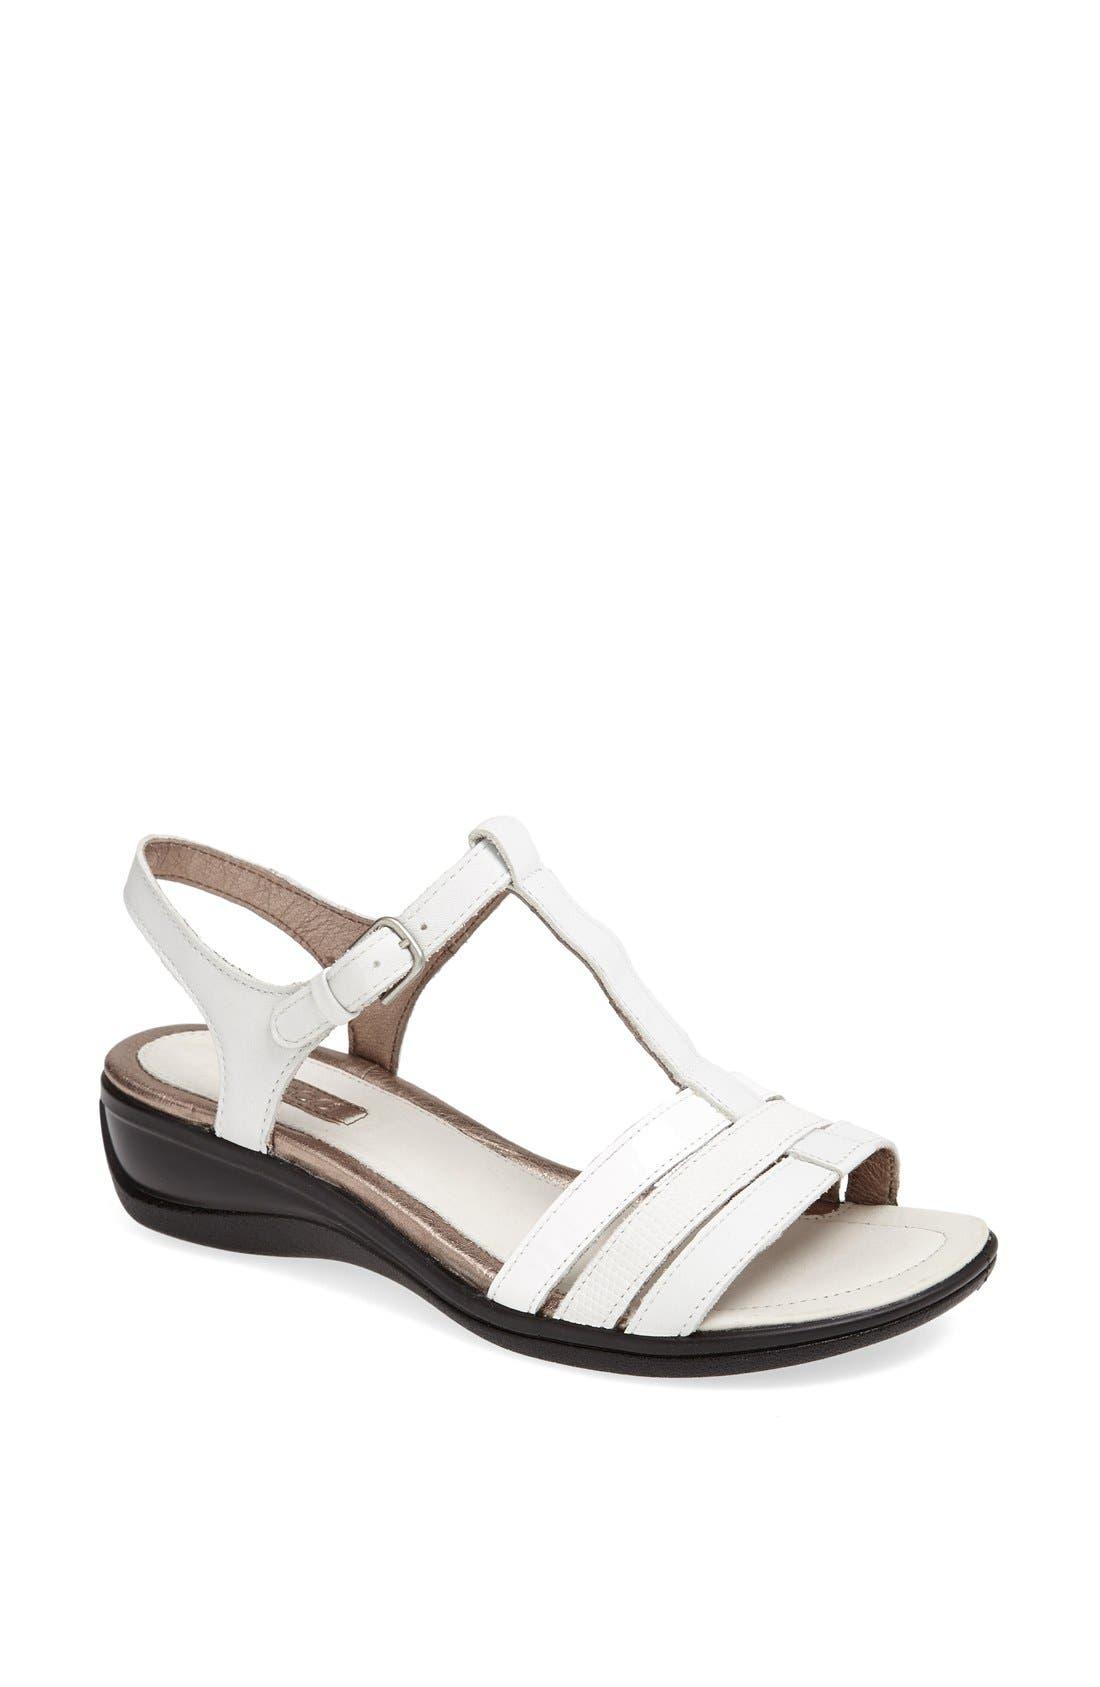 Main Image - ECCO 'Sensata' Sandal